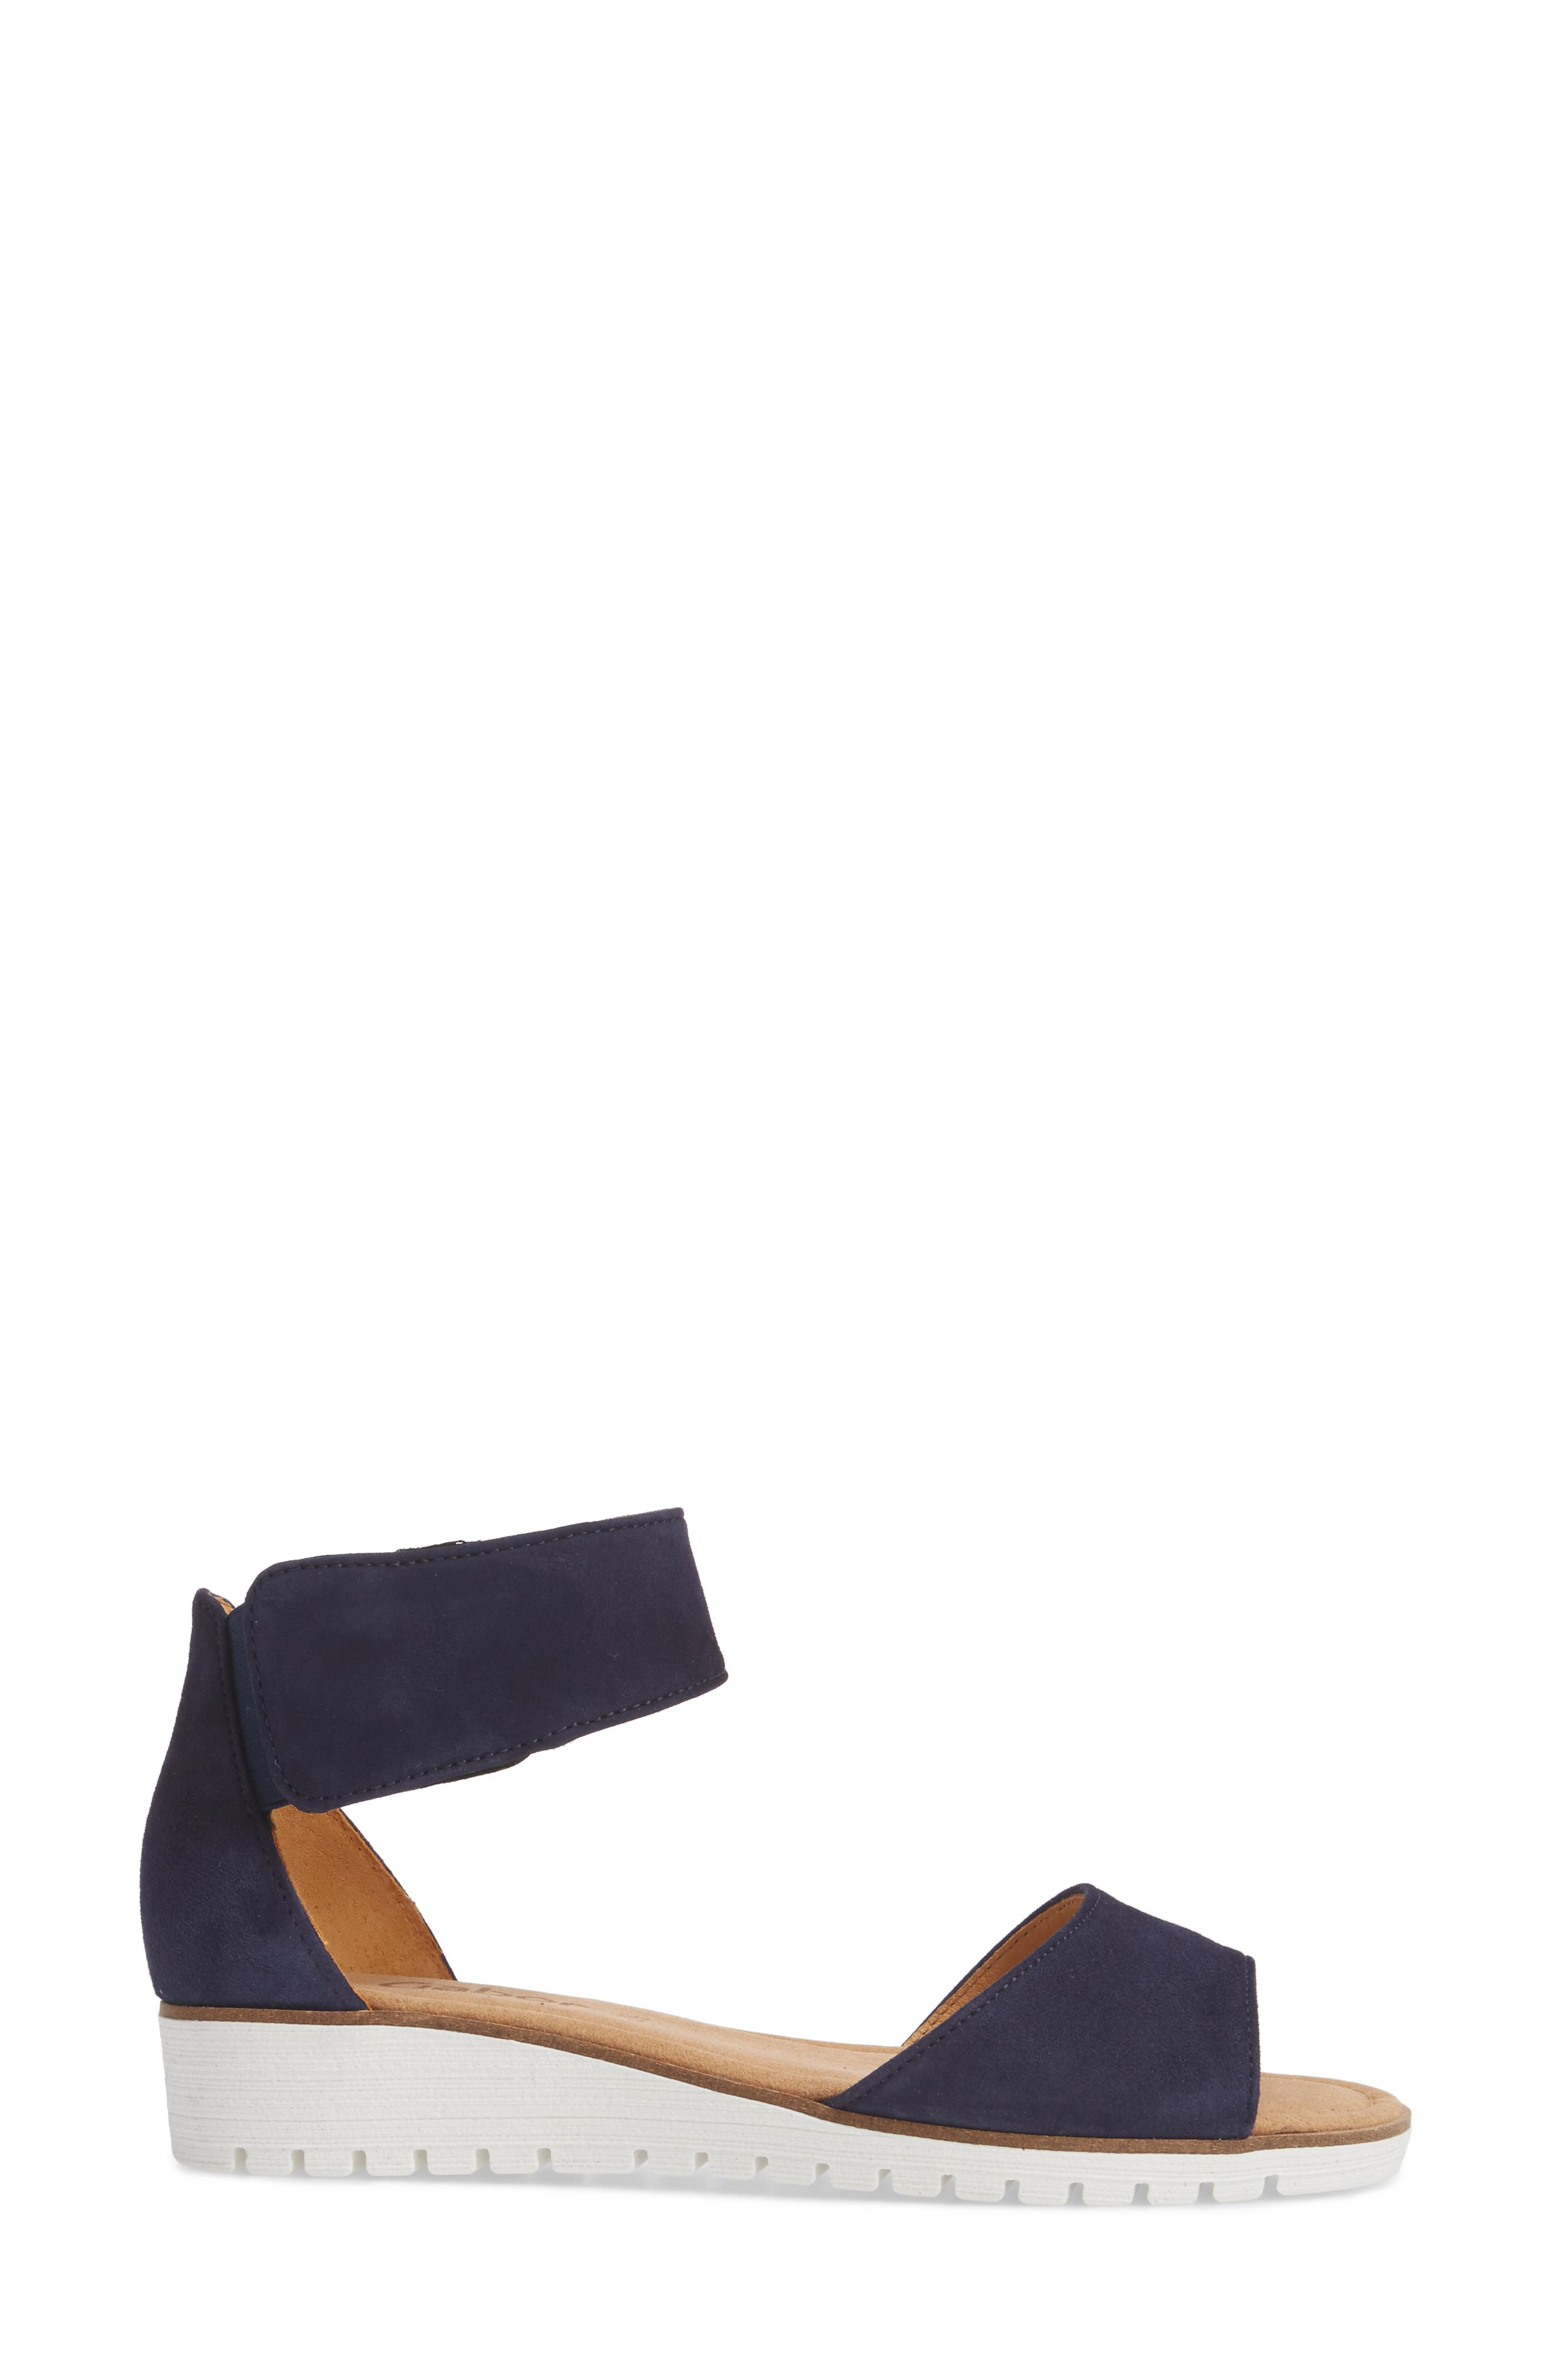 Ankle Strap Sandal,                             Alternate thumbnail 3, color,                             BLUE SUEDE